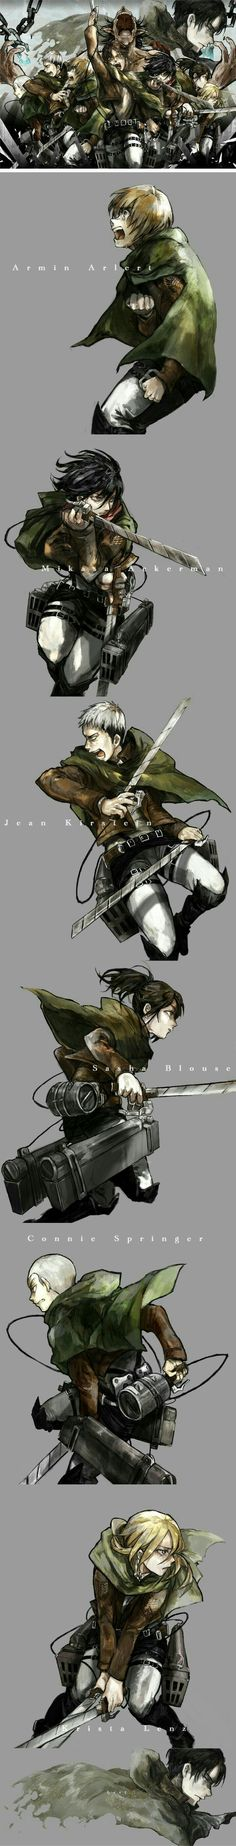 Attack on Titan characters, Armin, Mikasa, Jean, Sasha, Connie, Krista, Levi, text, sad, crying, Eren, Titan form, chains; Attack on Titan